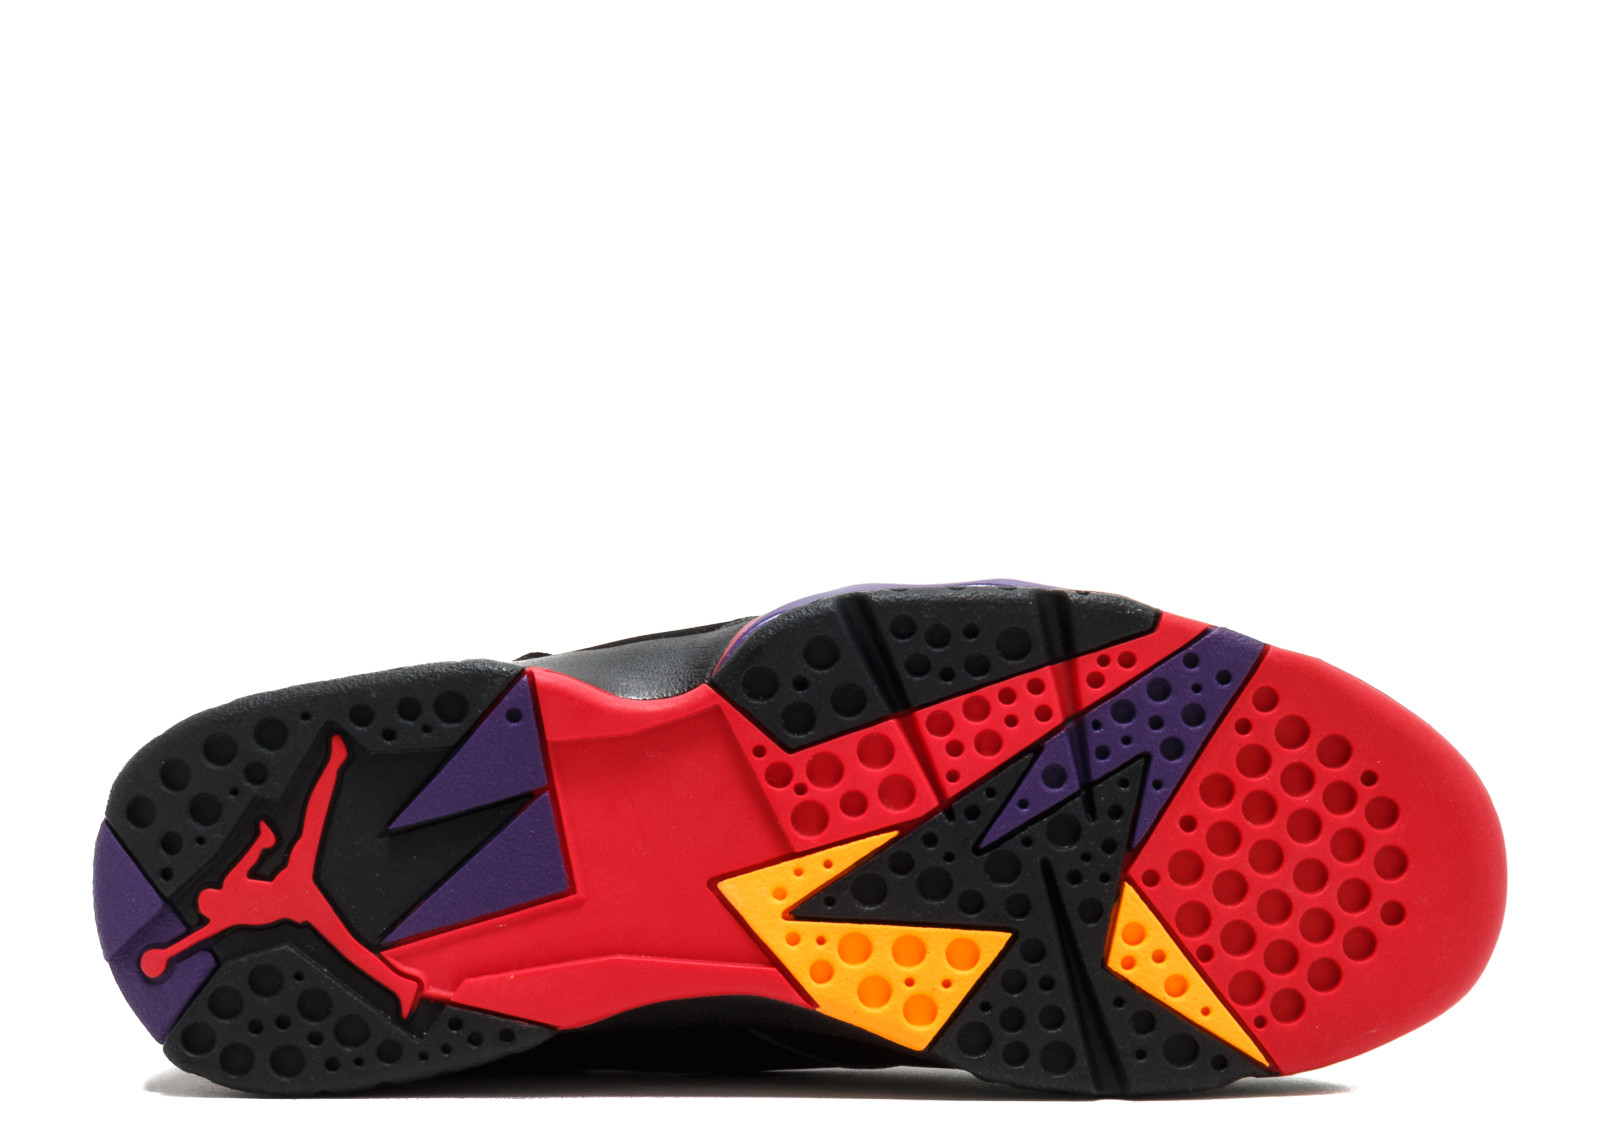 sale retailer 3587b 41667 Jordan 7 Retro Raptors (2012) - 4